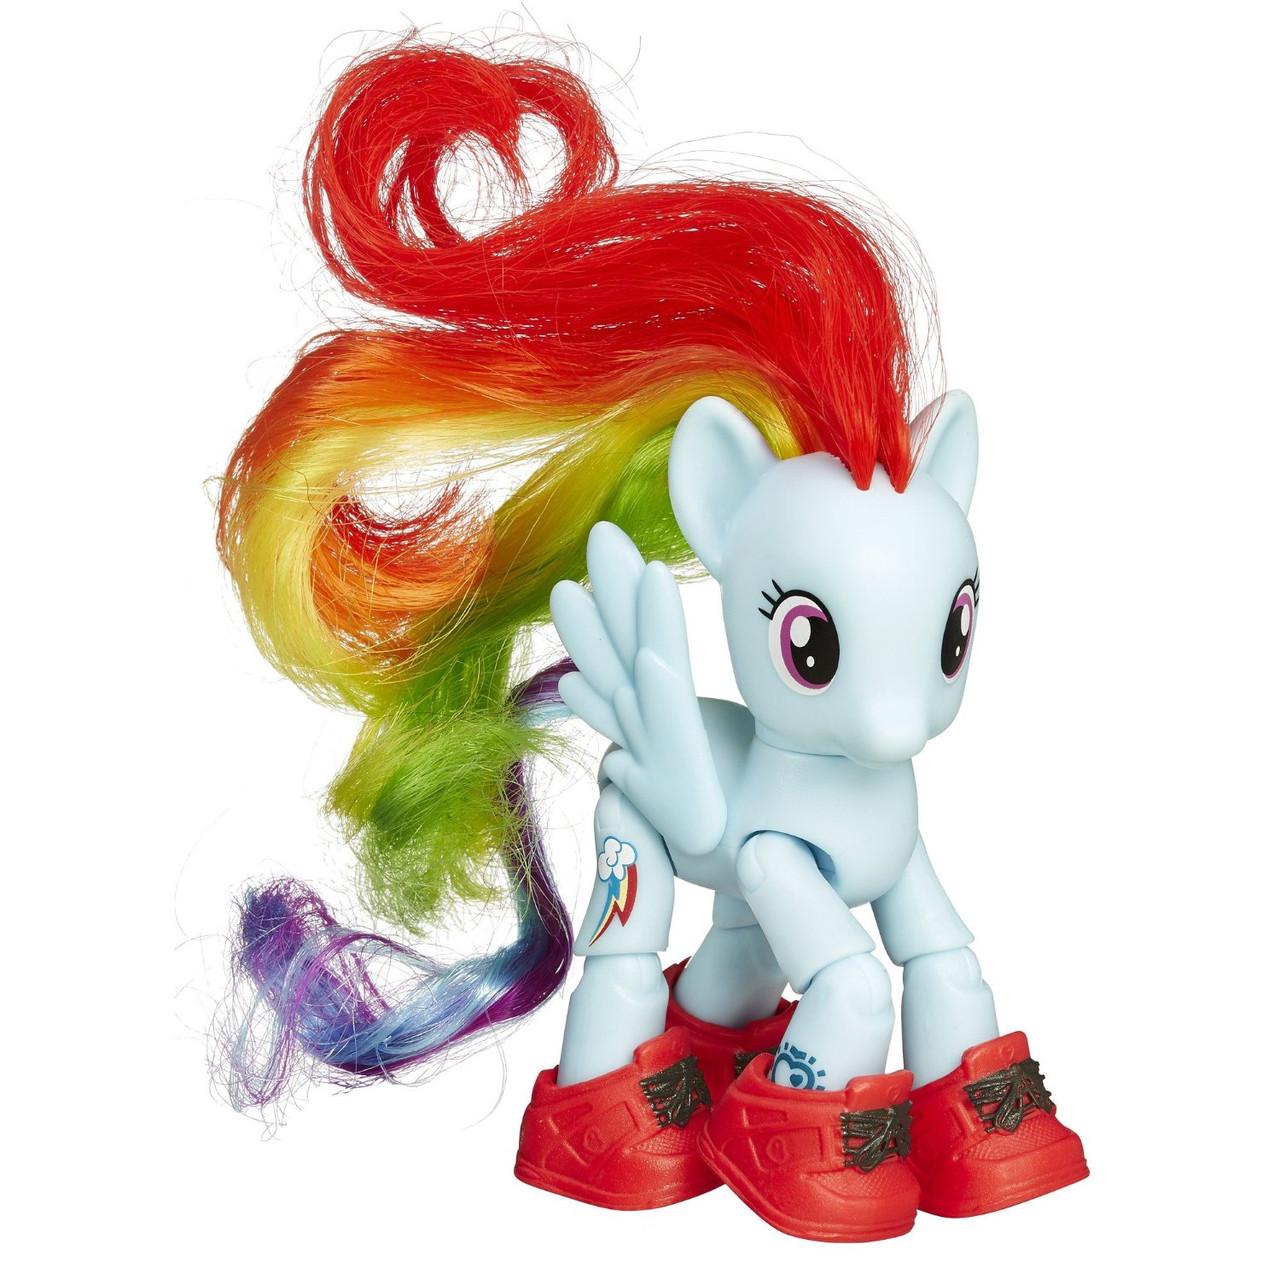 My Little Pony Радуга Рейнбоу Дэш Friendship is Magic Rainbow Dash Sightseeing Figure